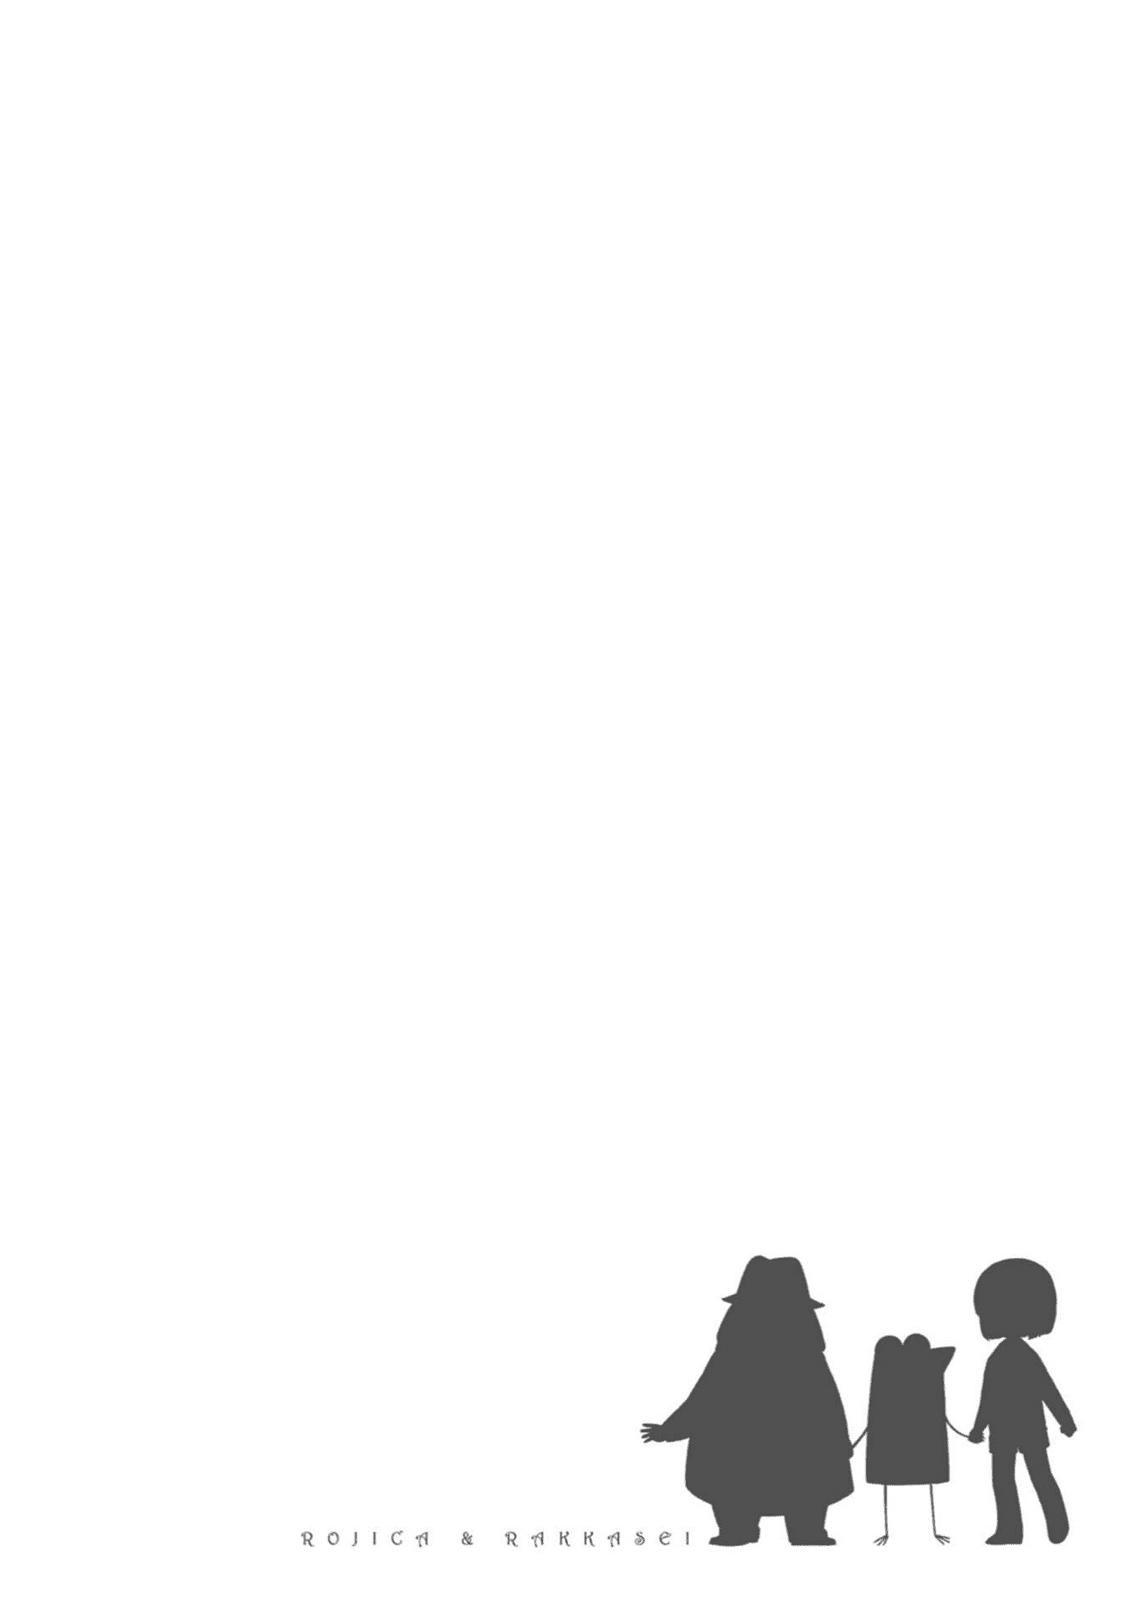 Rojica To Rakkasei Chapter 19: The Mystery Of The Snowy Mountain page 38 - Mangakakalots.com